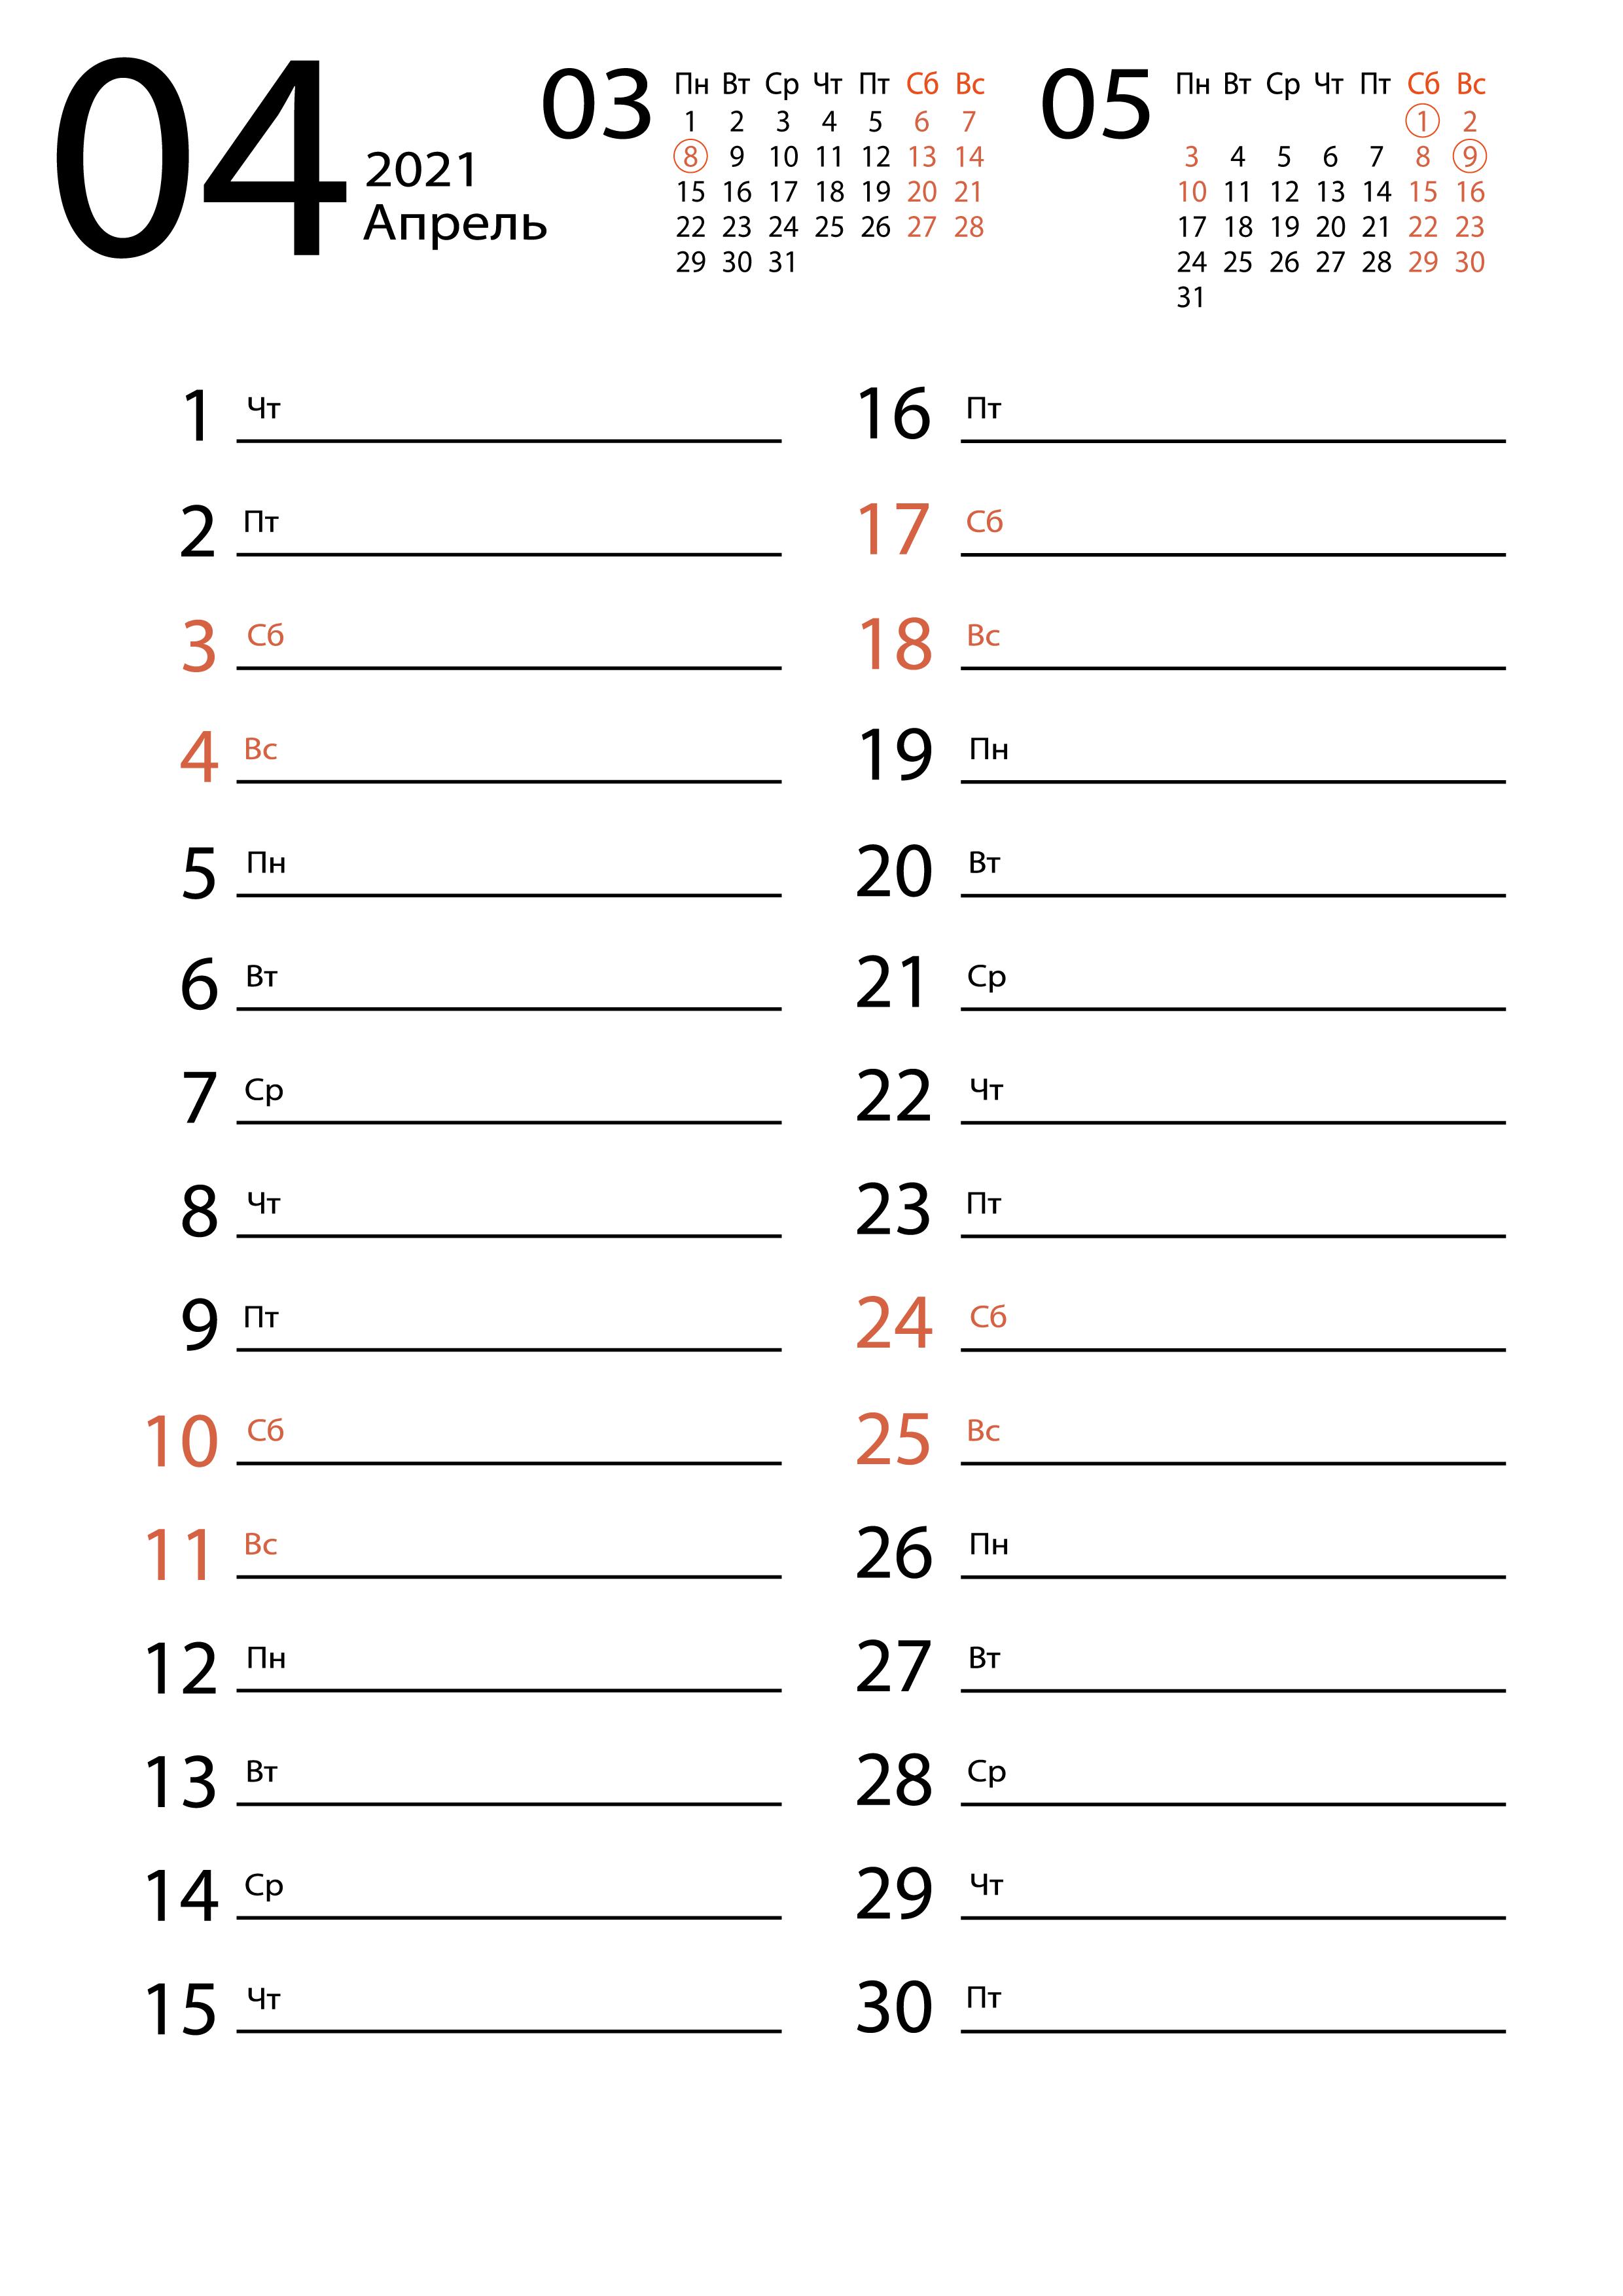 Календарь для заметок на Апрель 2021 года